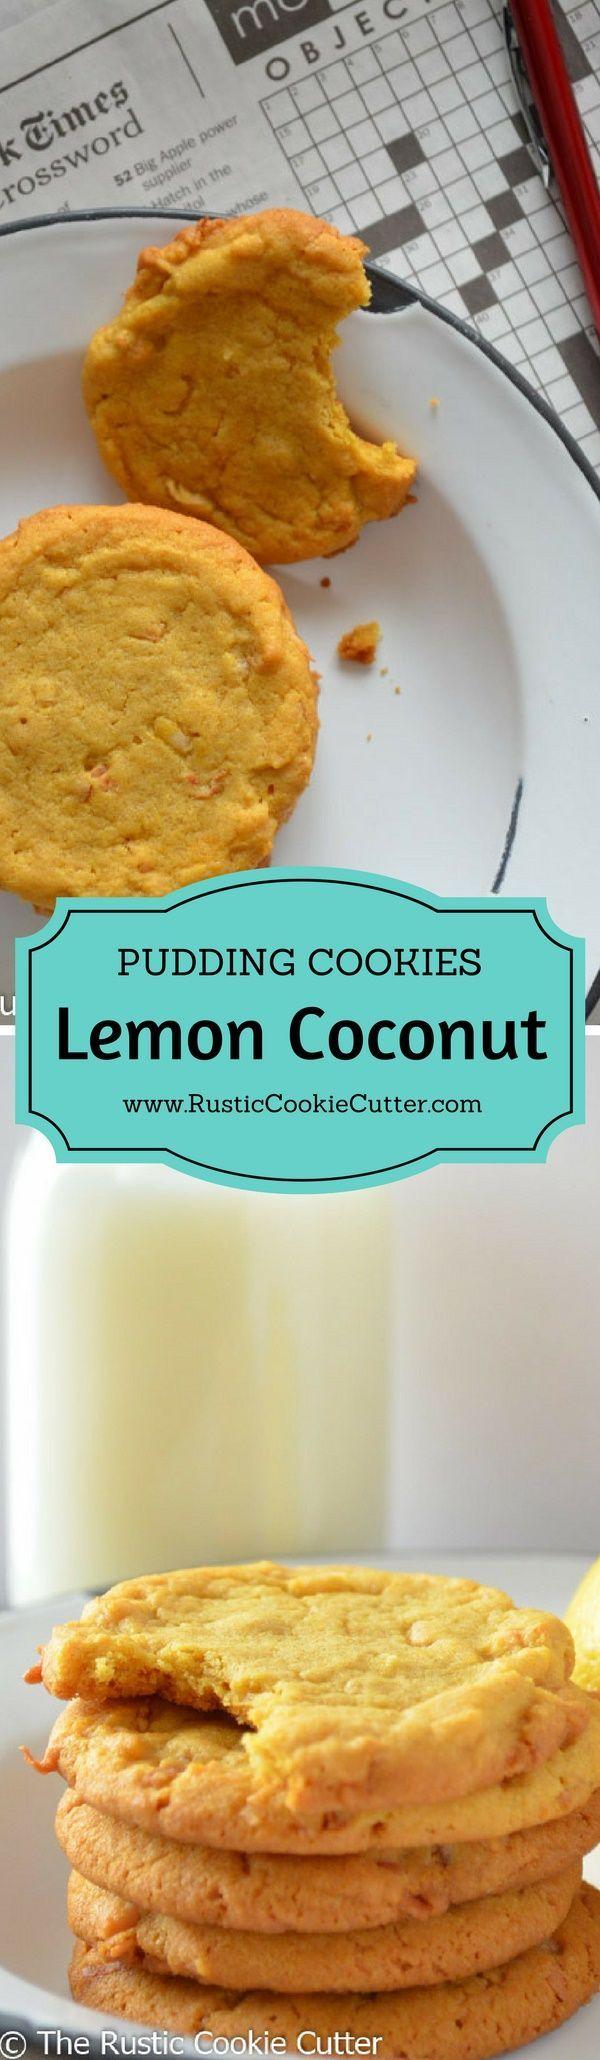 Super Soft & Chewy Lemon Pudding Cookies - Lemon Coconut Pudding Cookies